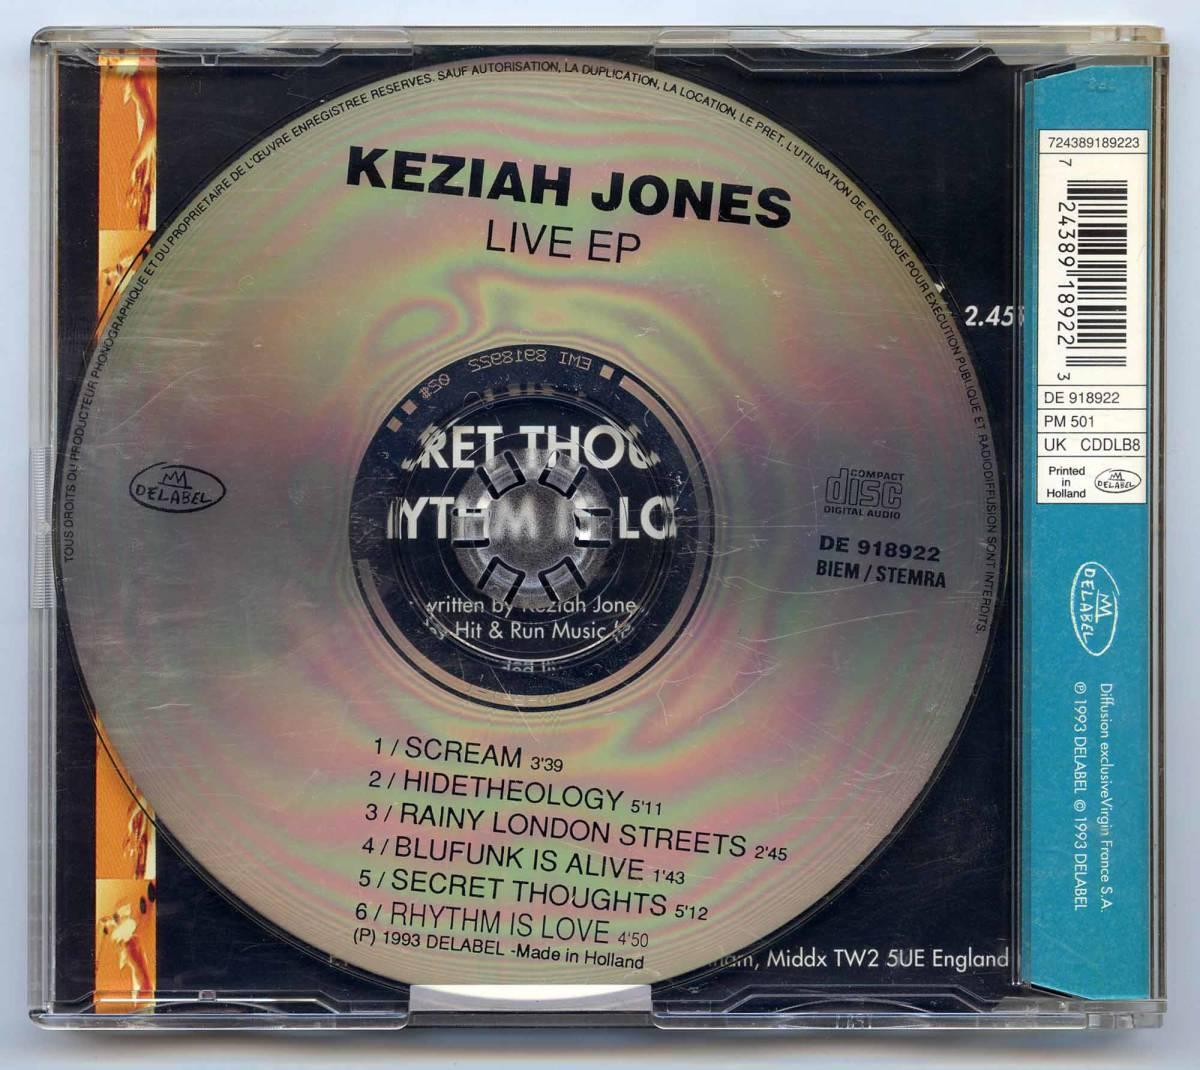 Keziah Jones(キザイア・ジョーンズ)CD ミニアルバム「Live EP」EU盤(オランダ製)DE 918922_画像2